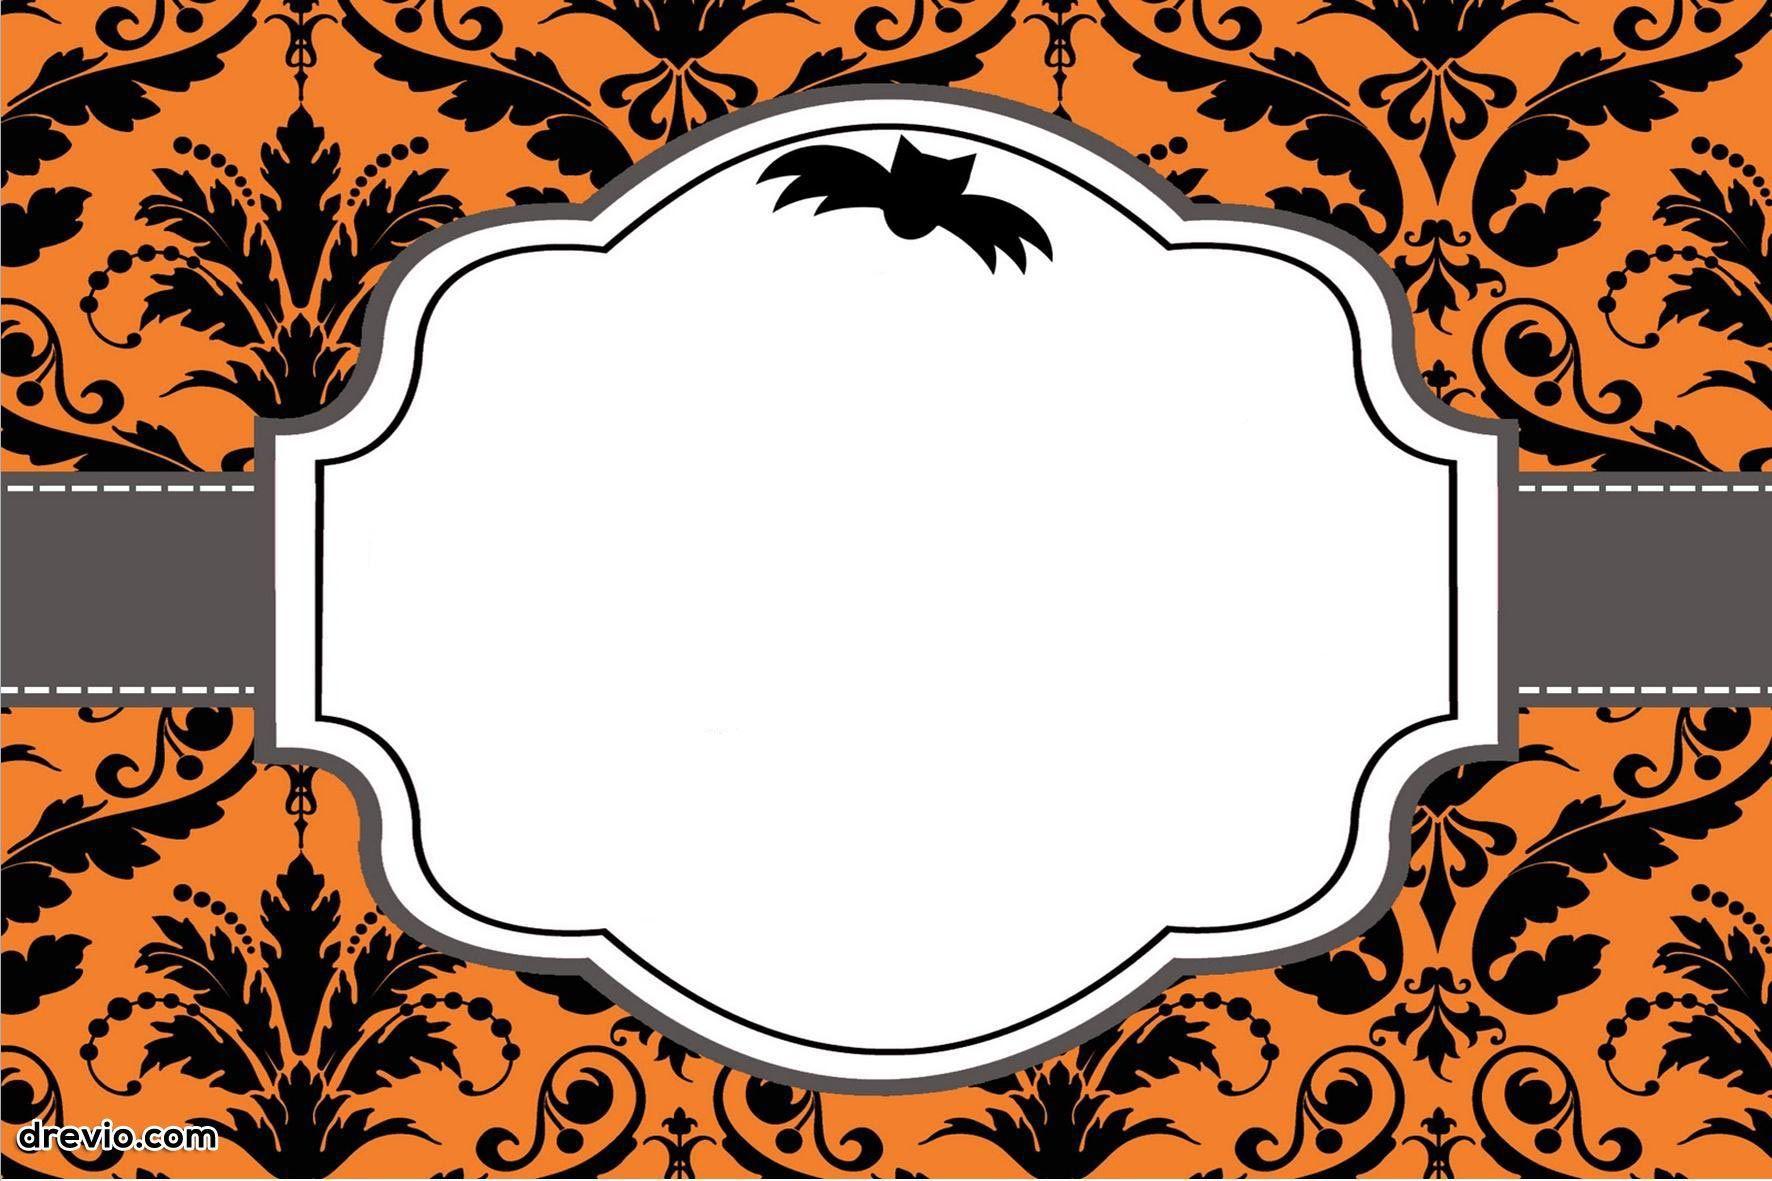 003 Surprising Free Halloween Invitation Template Design  Templates Online Printable Birthday Party WeddingFull